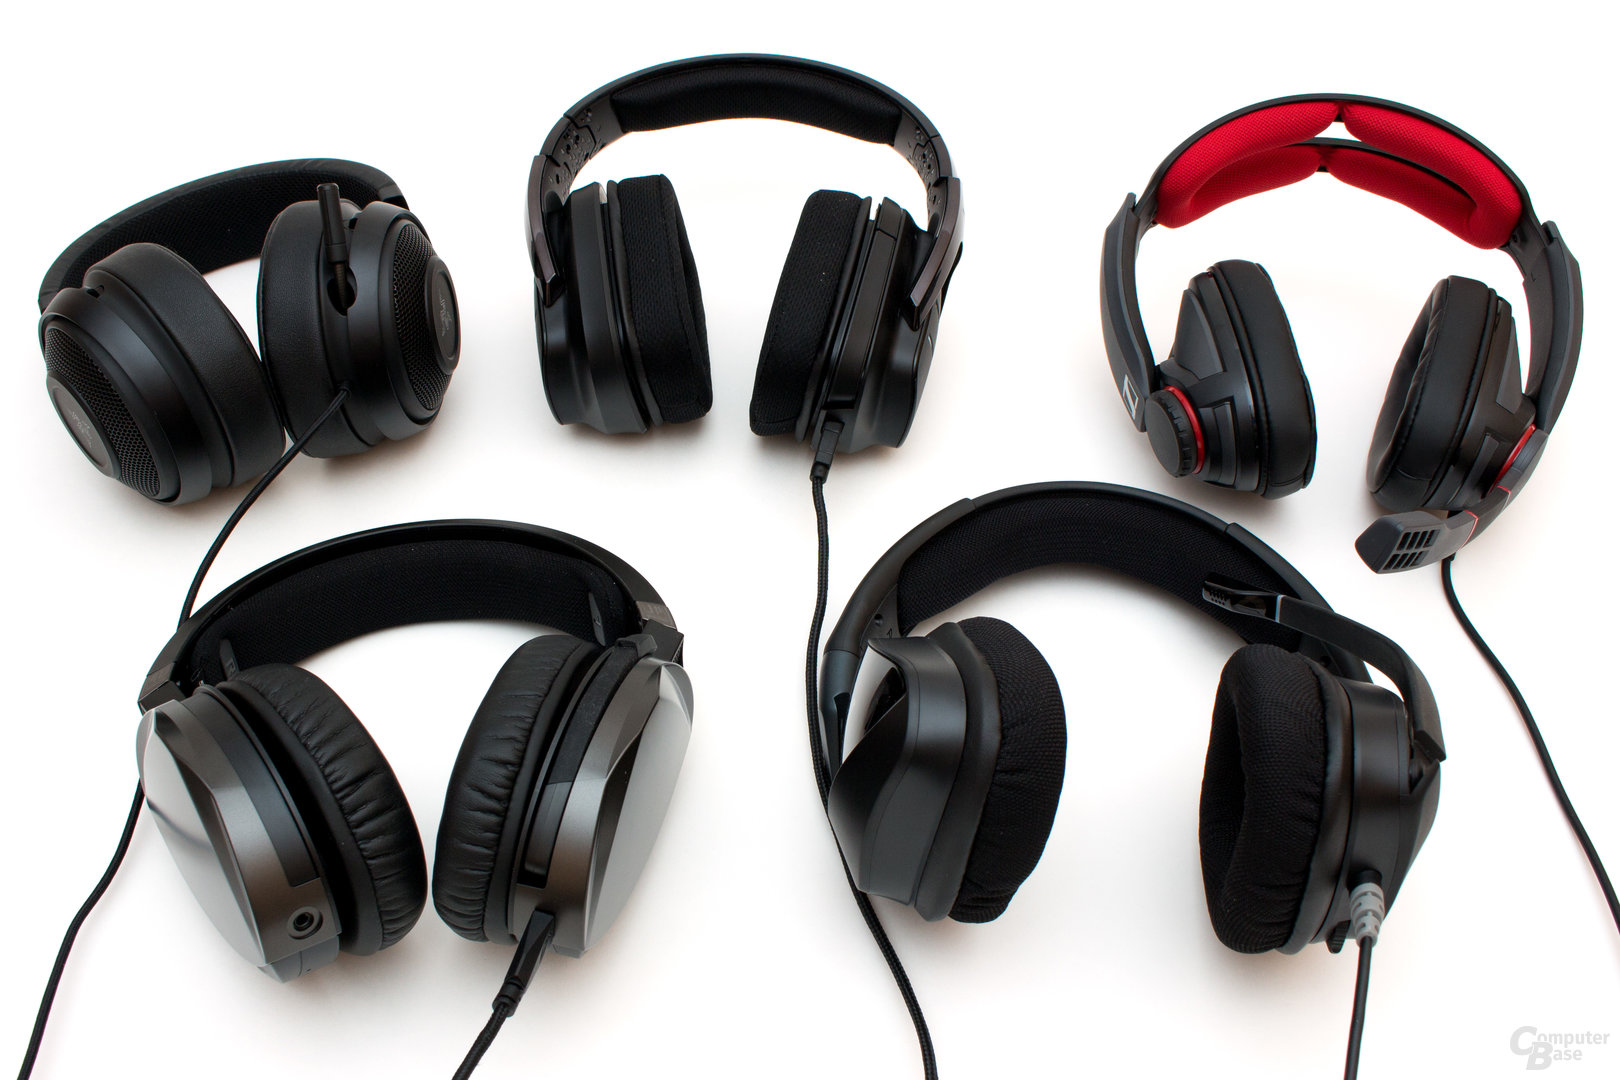 Headset-Test-22